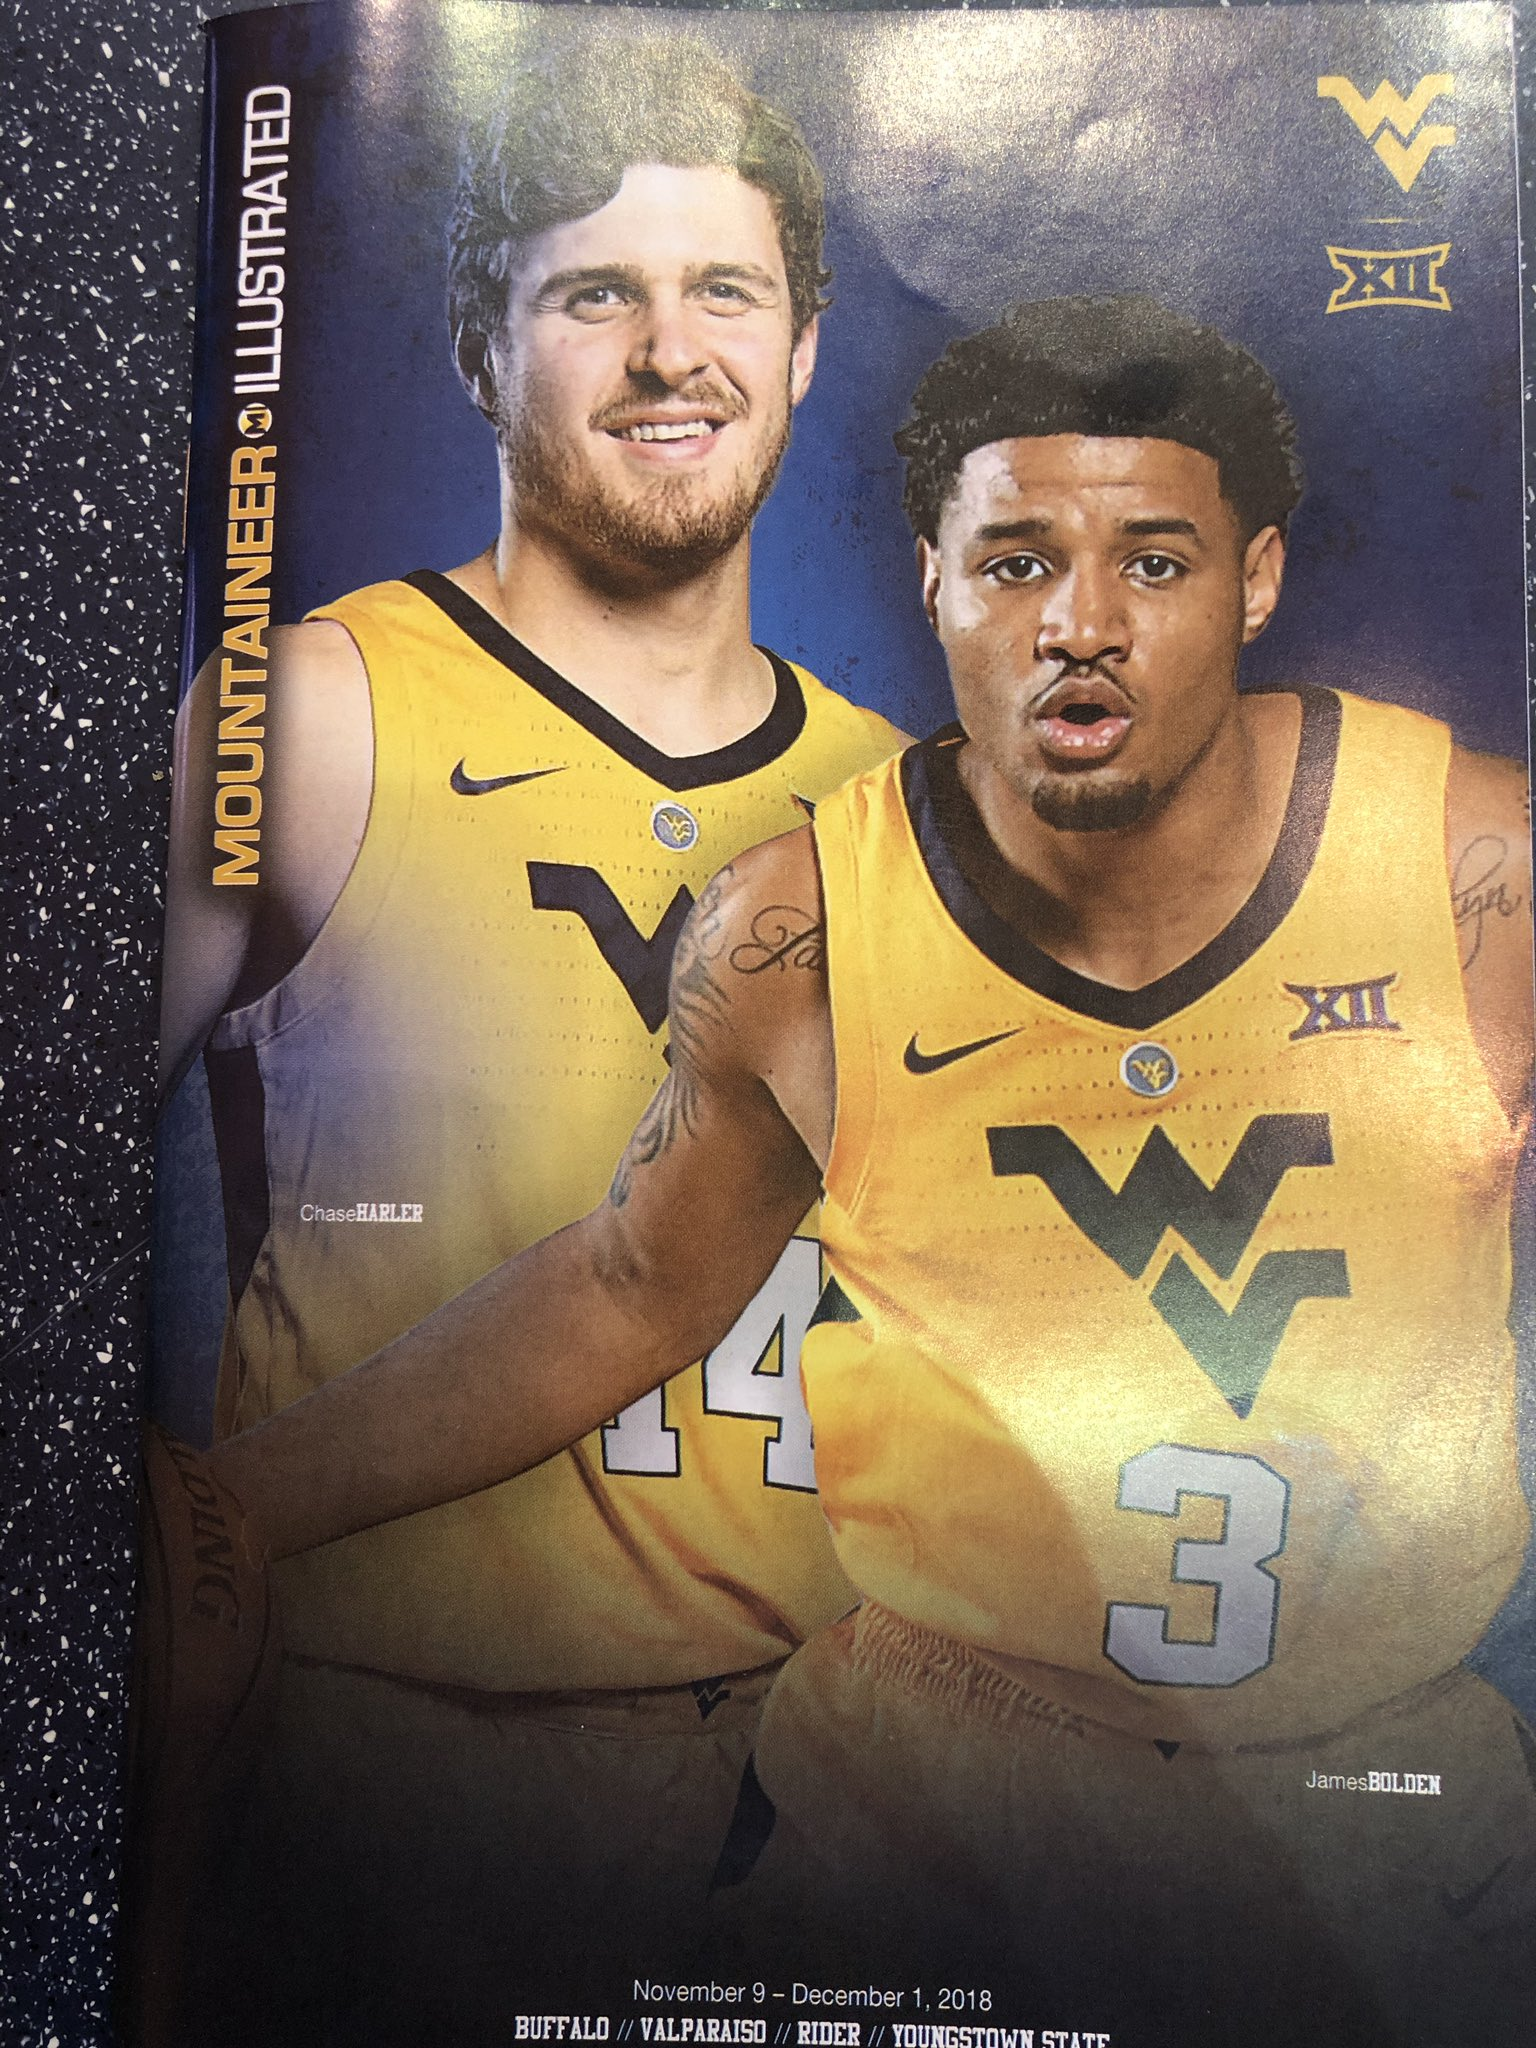 Chase Harler West Virginia Basketball Jersey - Yellow